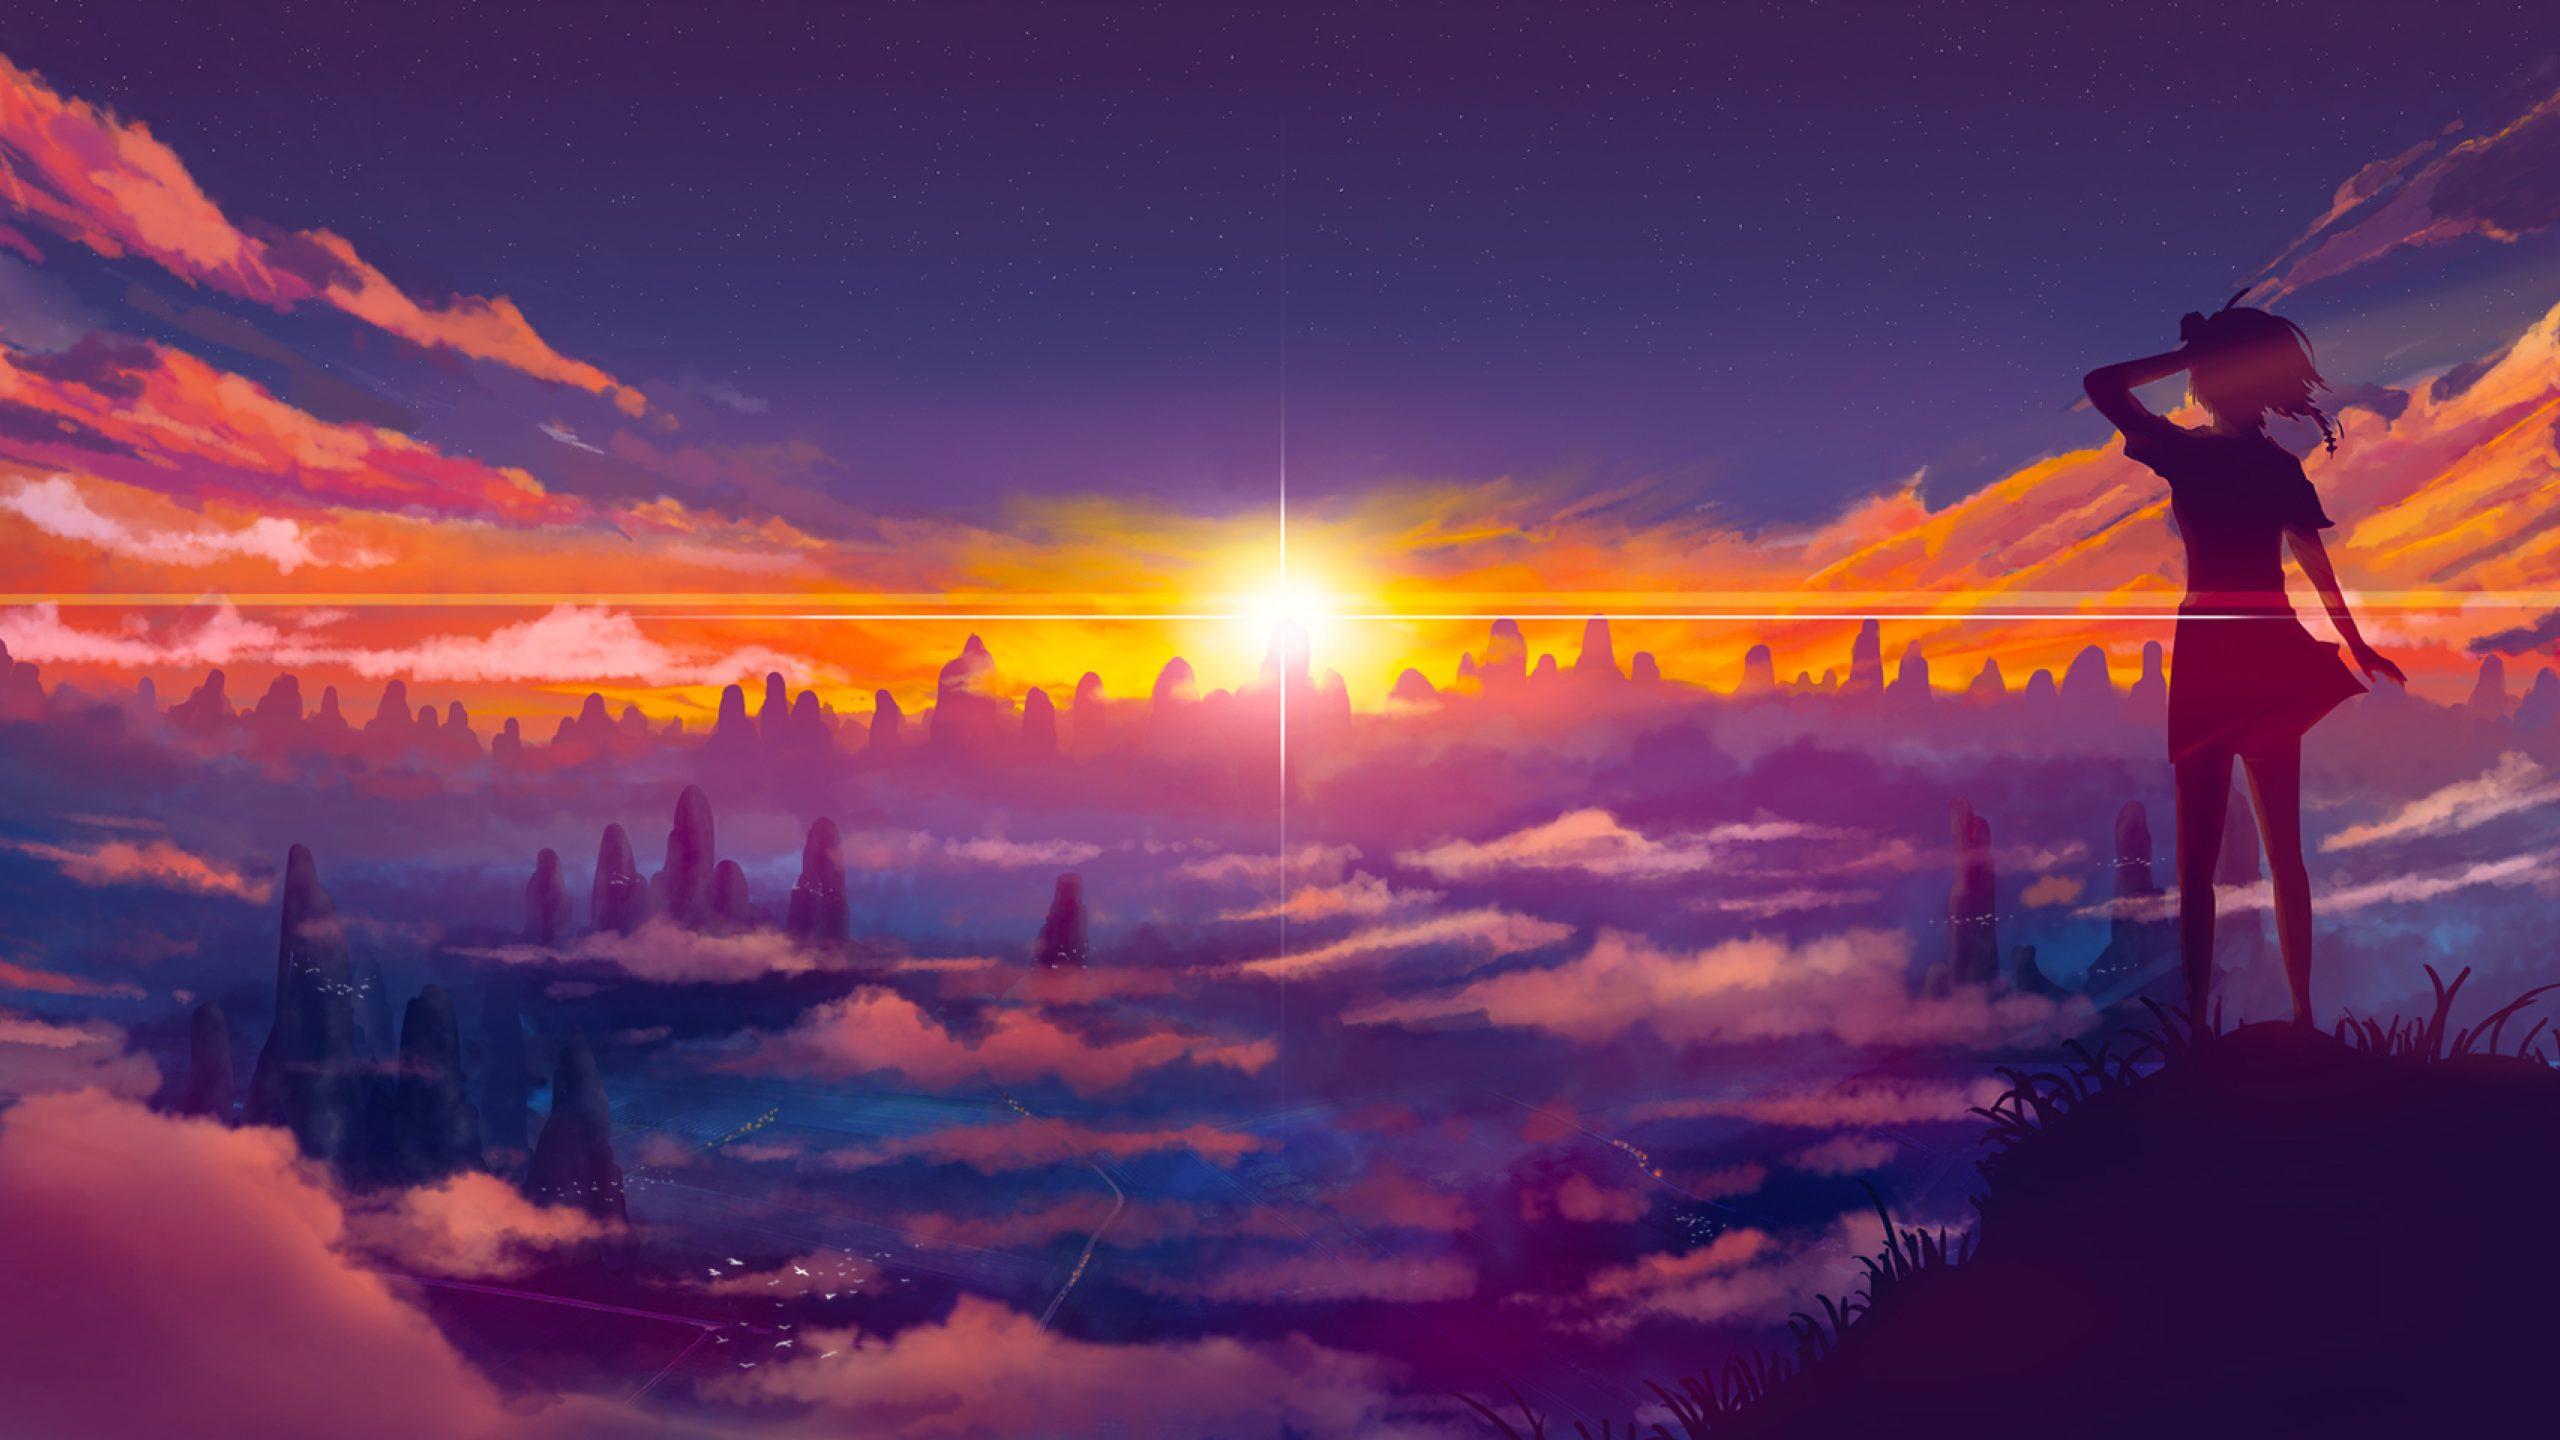 Anime Cloud desktop wallpaper